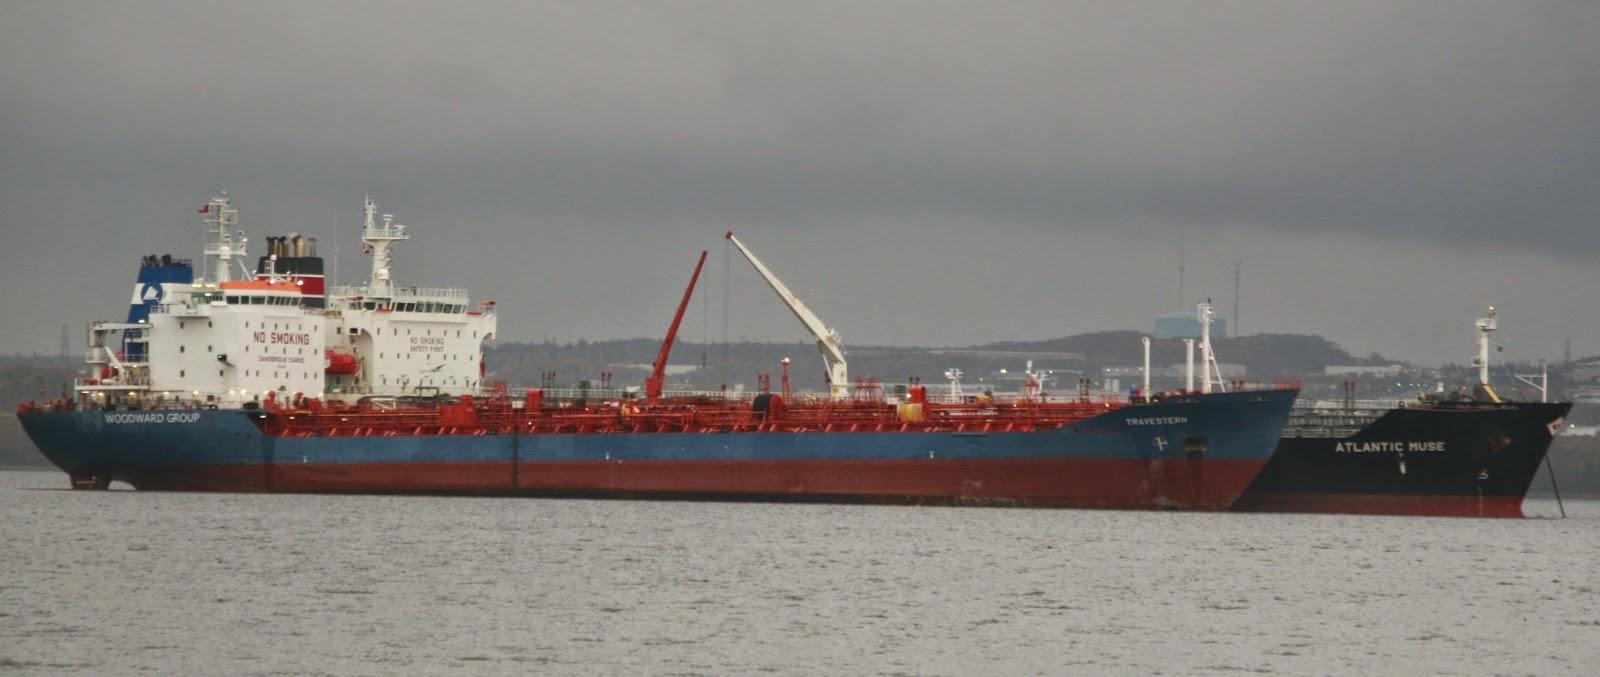 Overhead Crane Newfoundland : October halifax shipping news